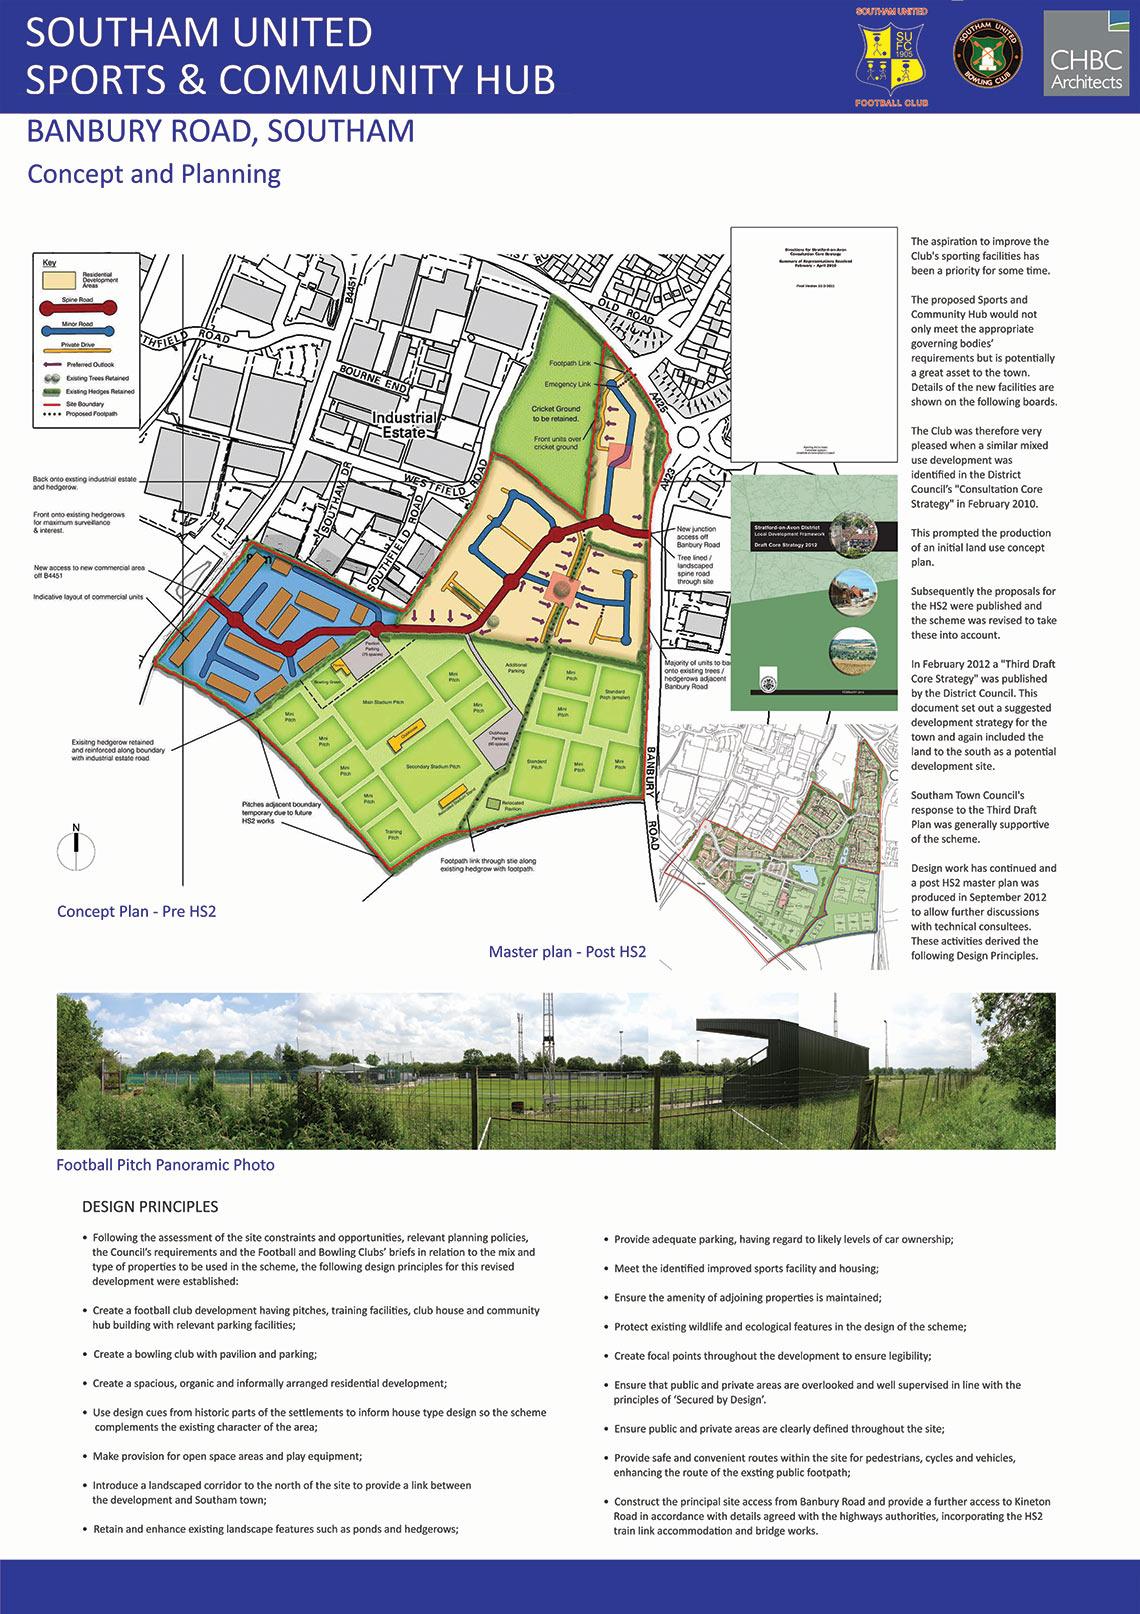 Project-Banbury-2-1140px